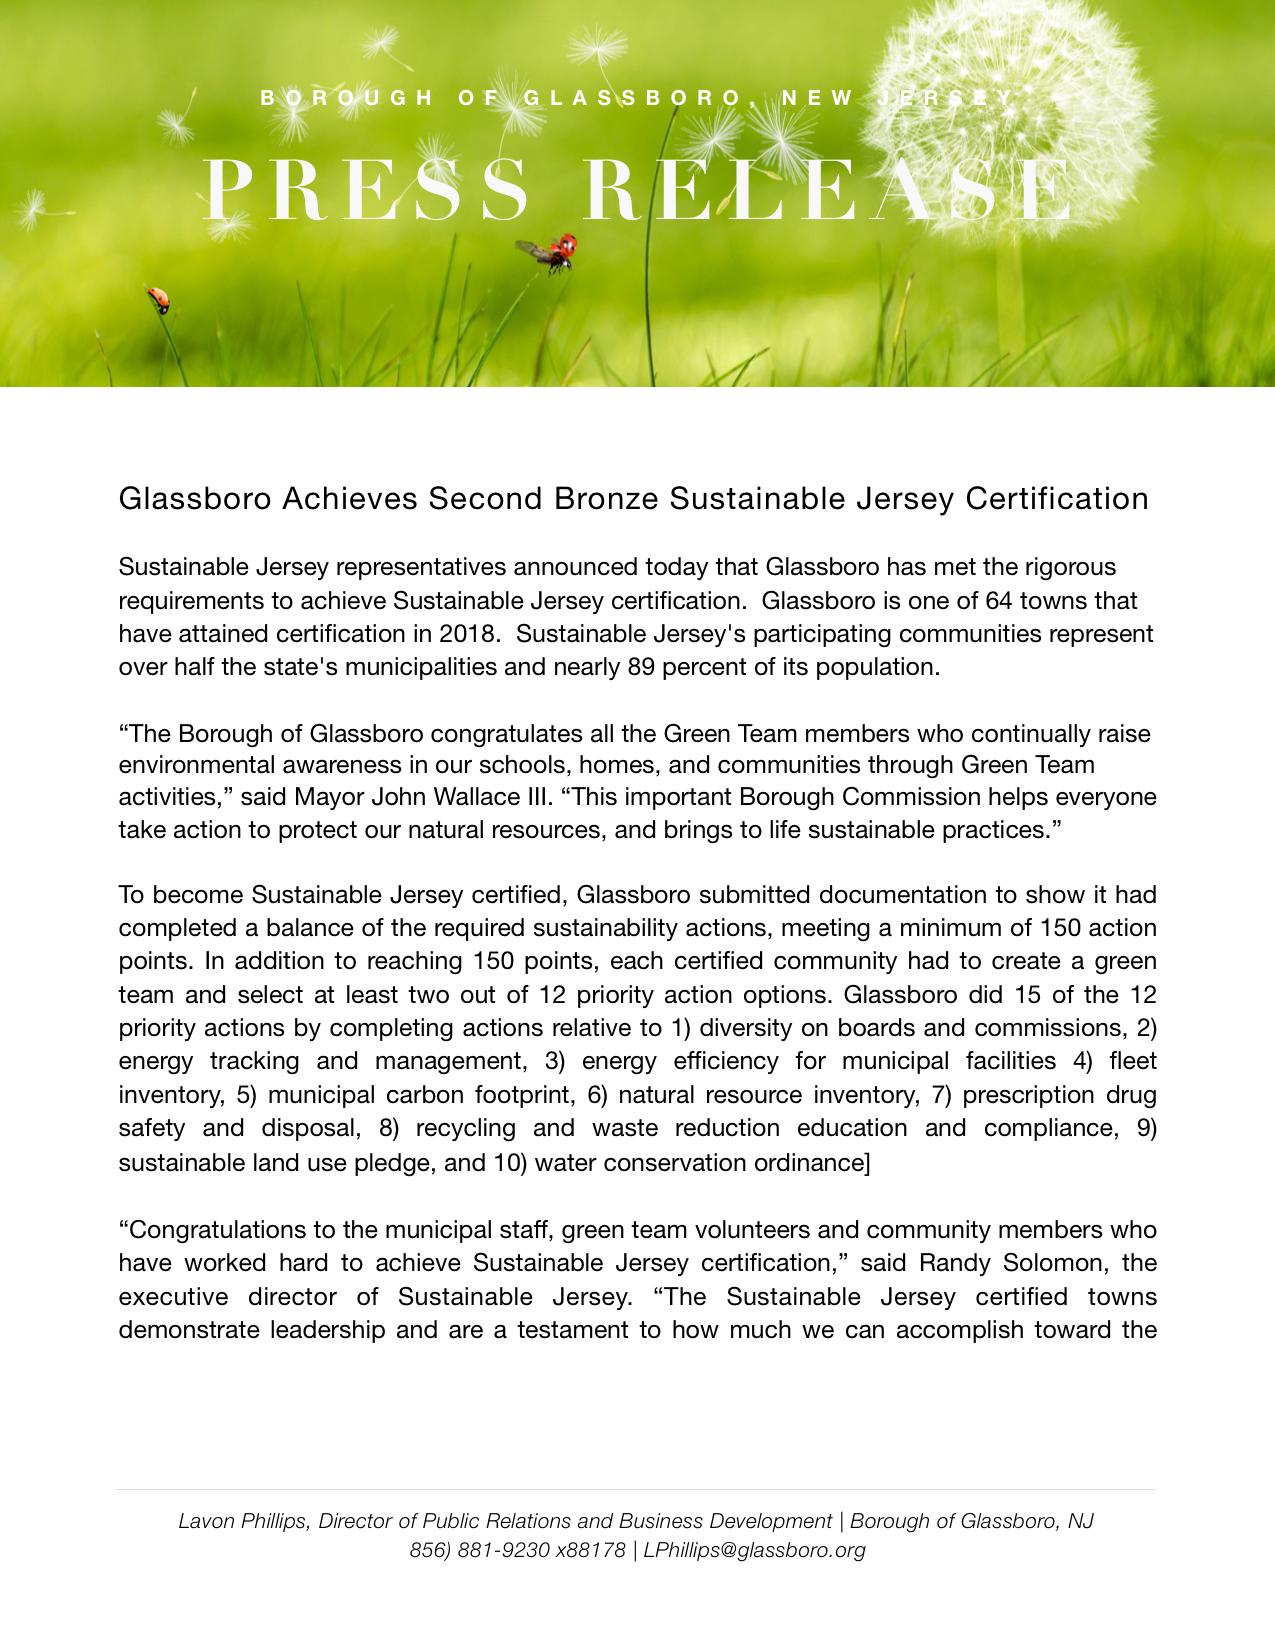 Glassboro NJ Press release Sustainable NJ Certification  copy.jpeg